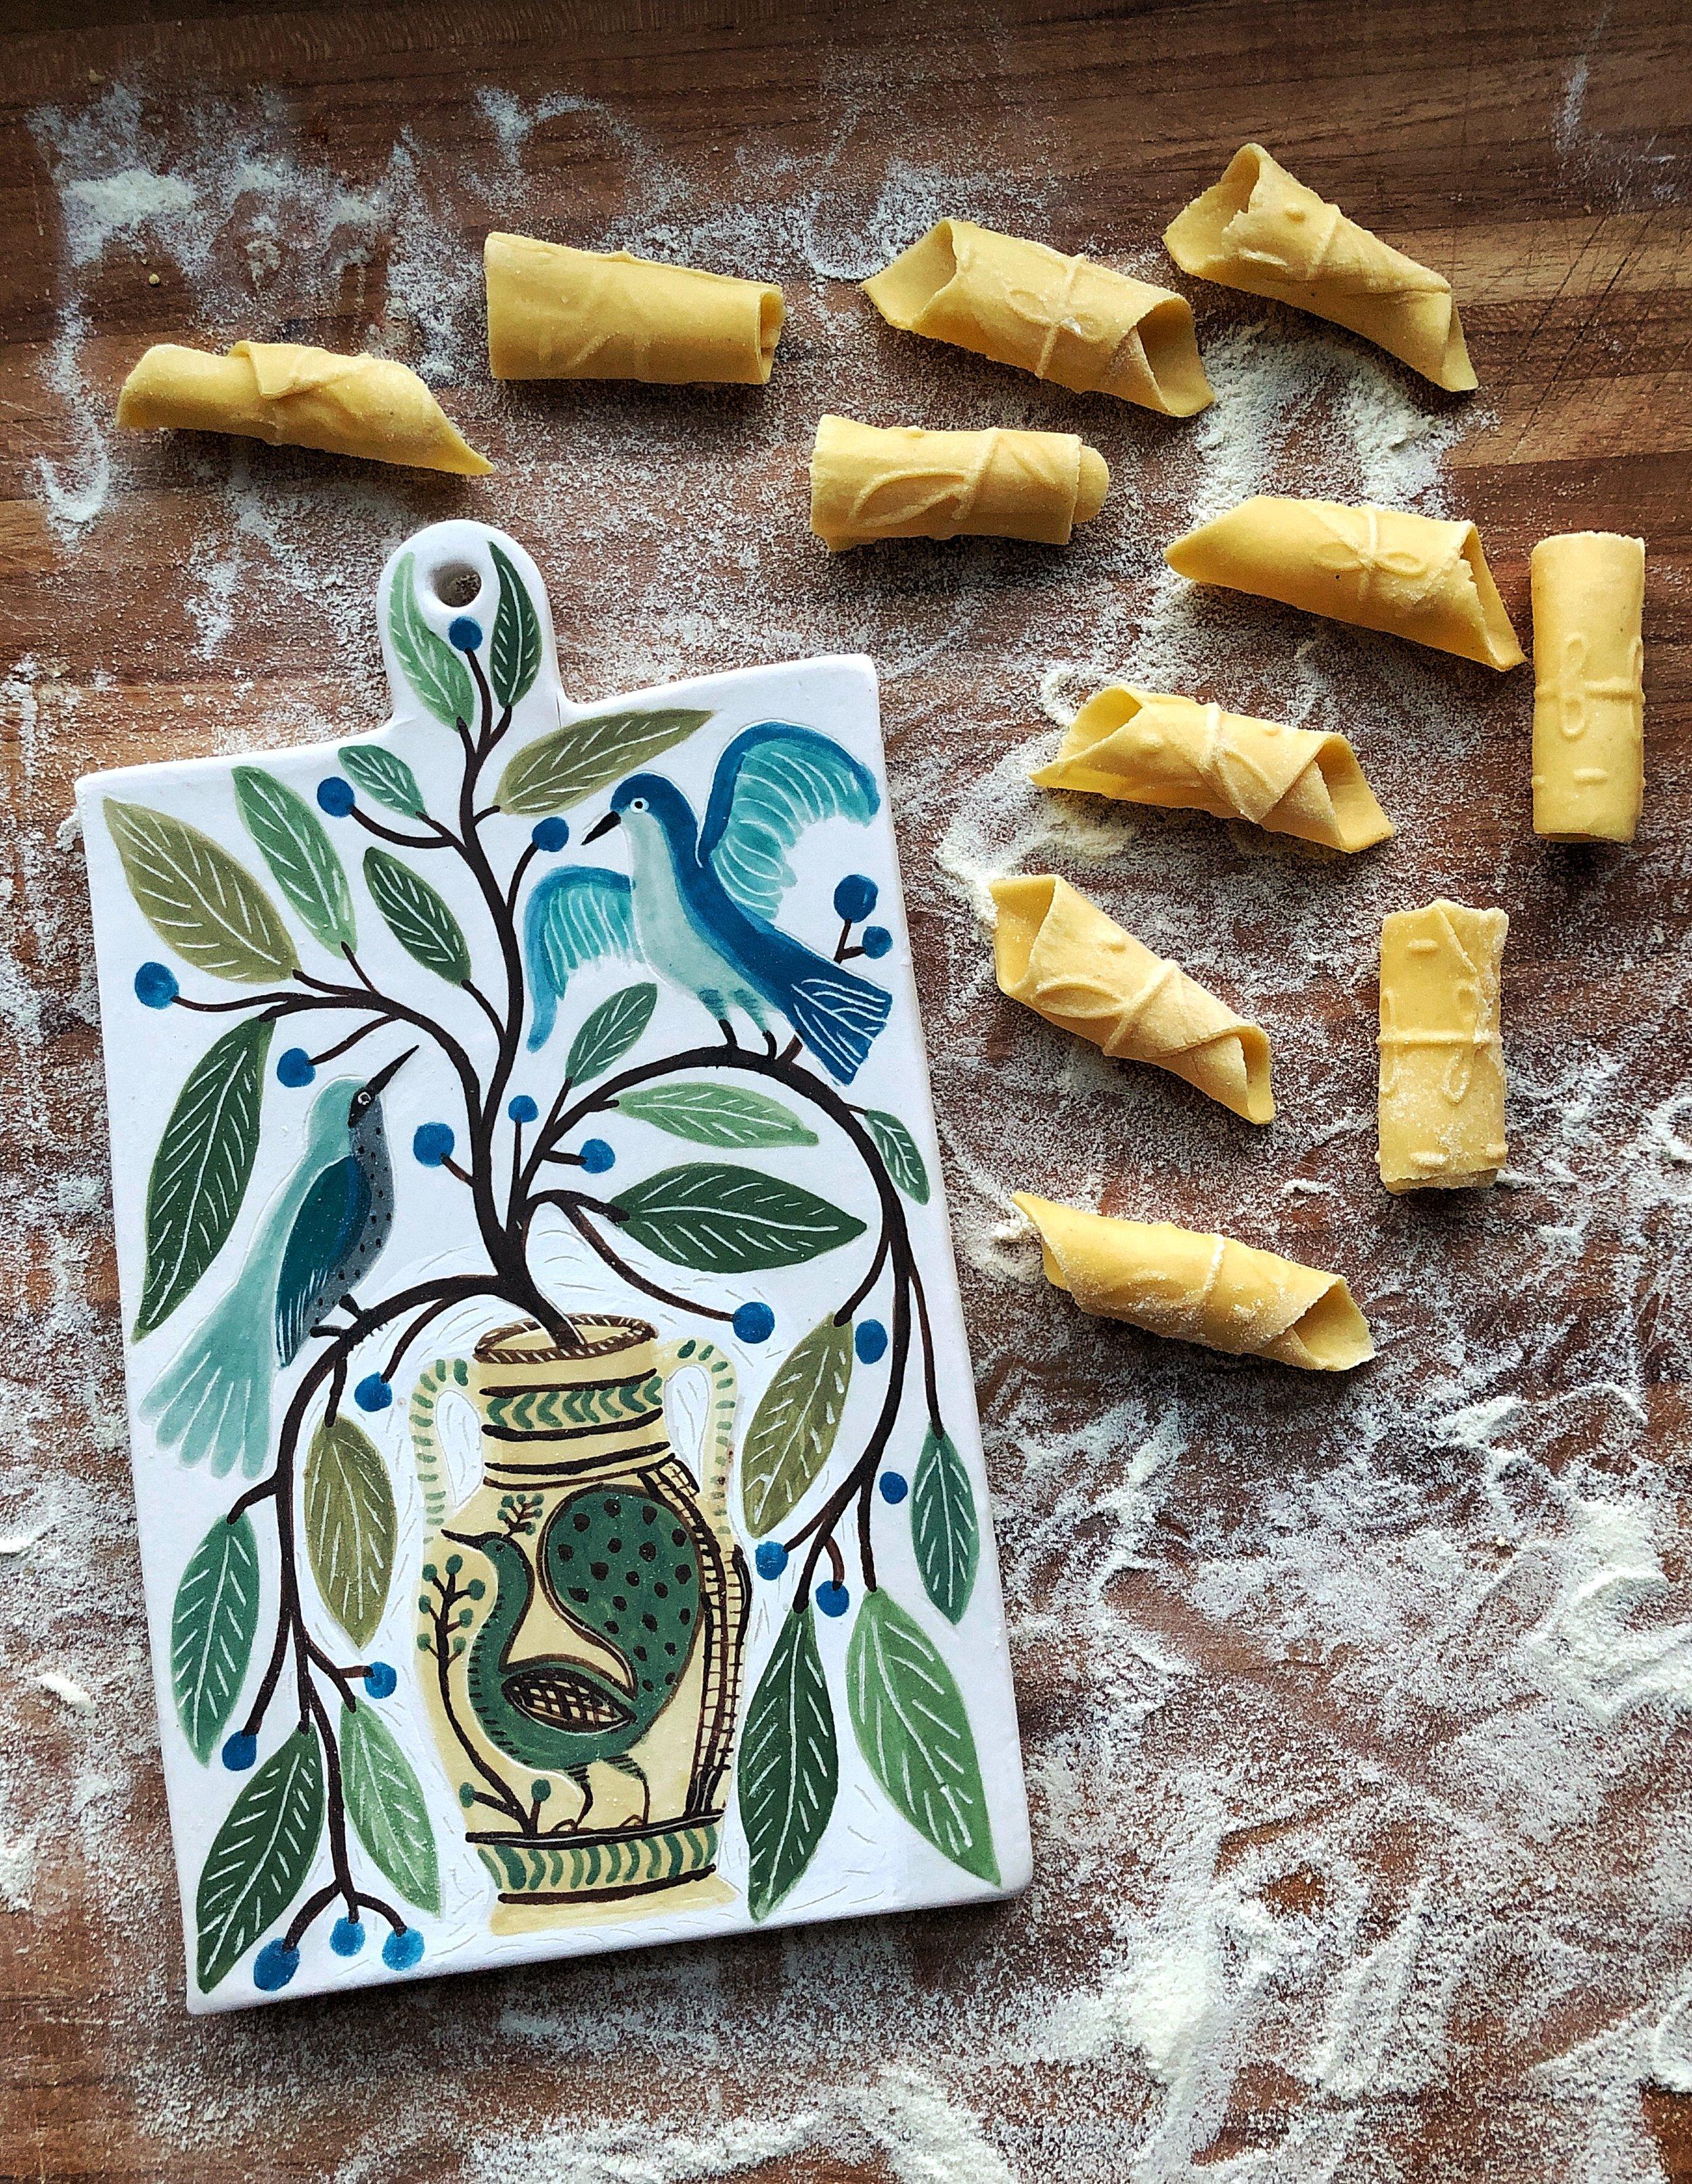 Gabrielle_Schaffner_pasta_board-peacock-vase_1.JPG